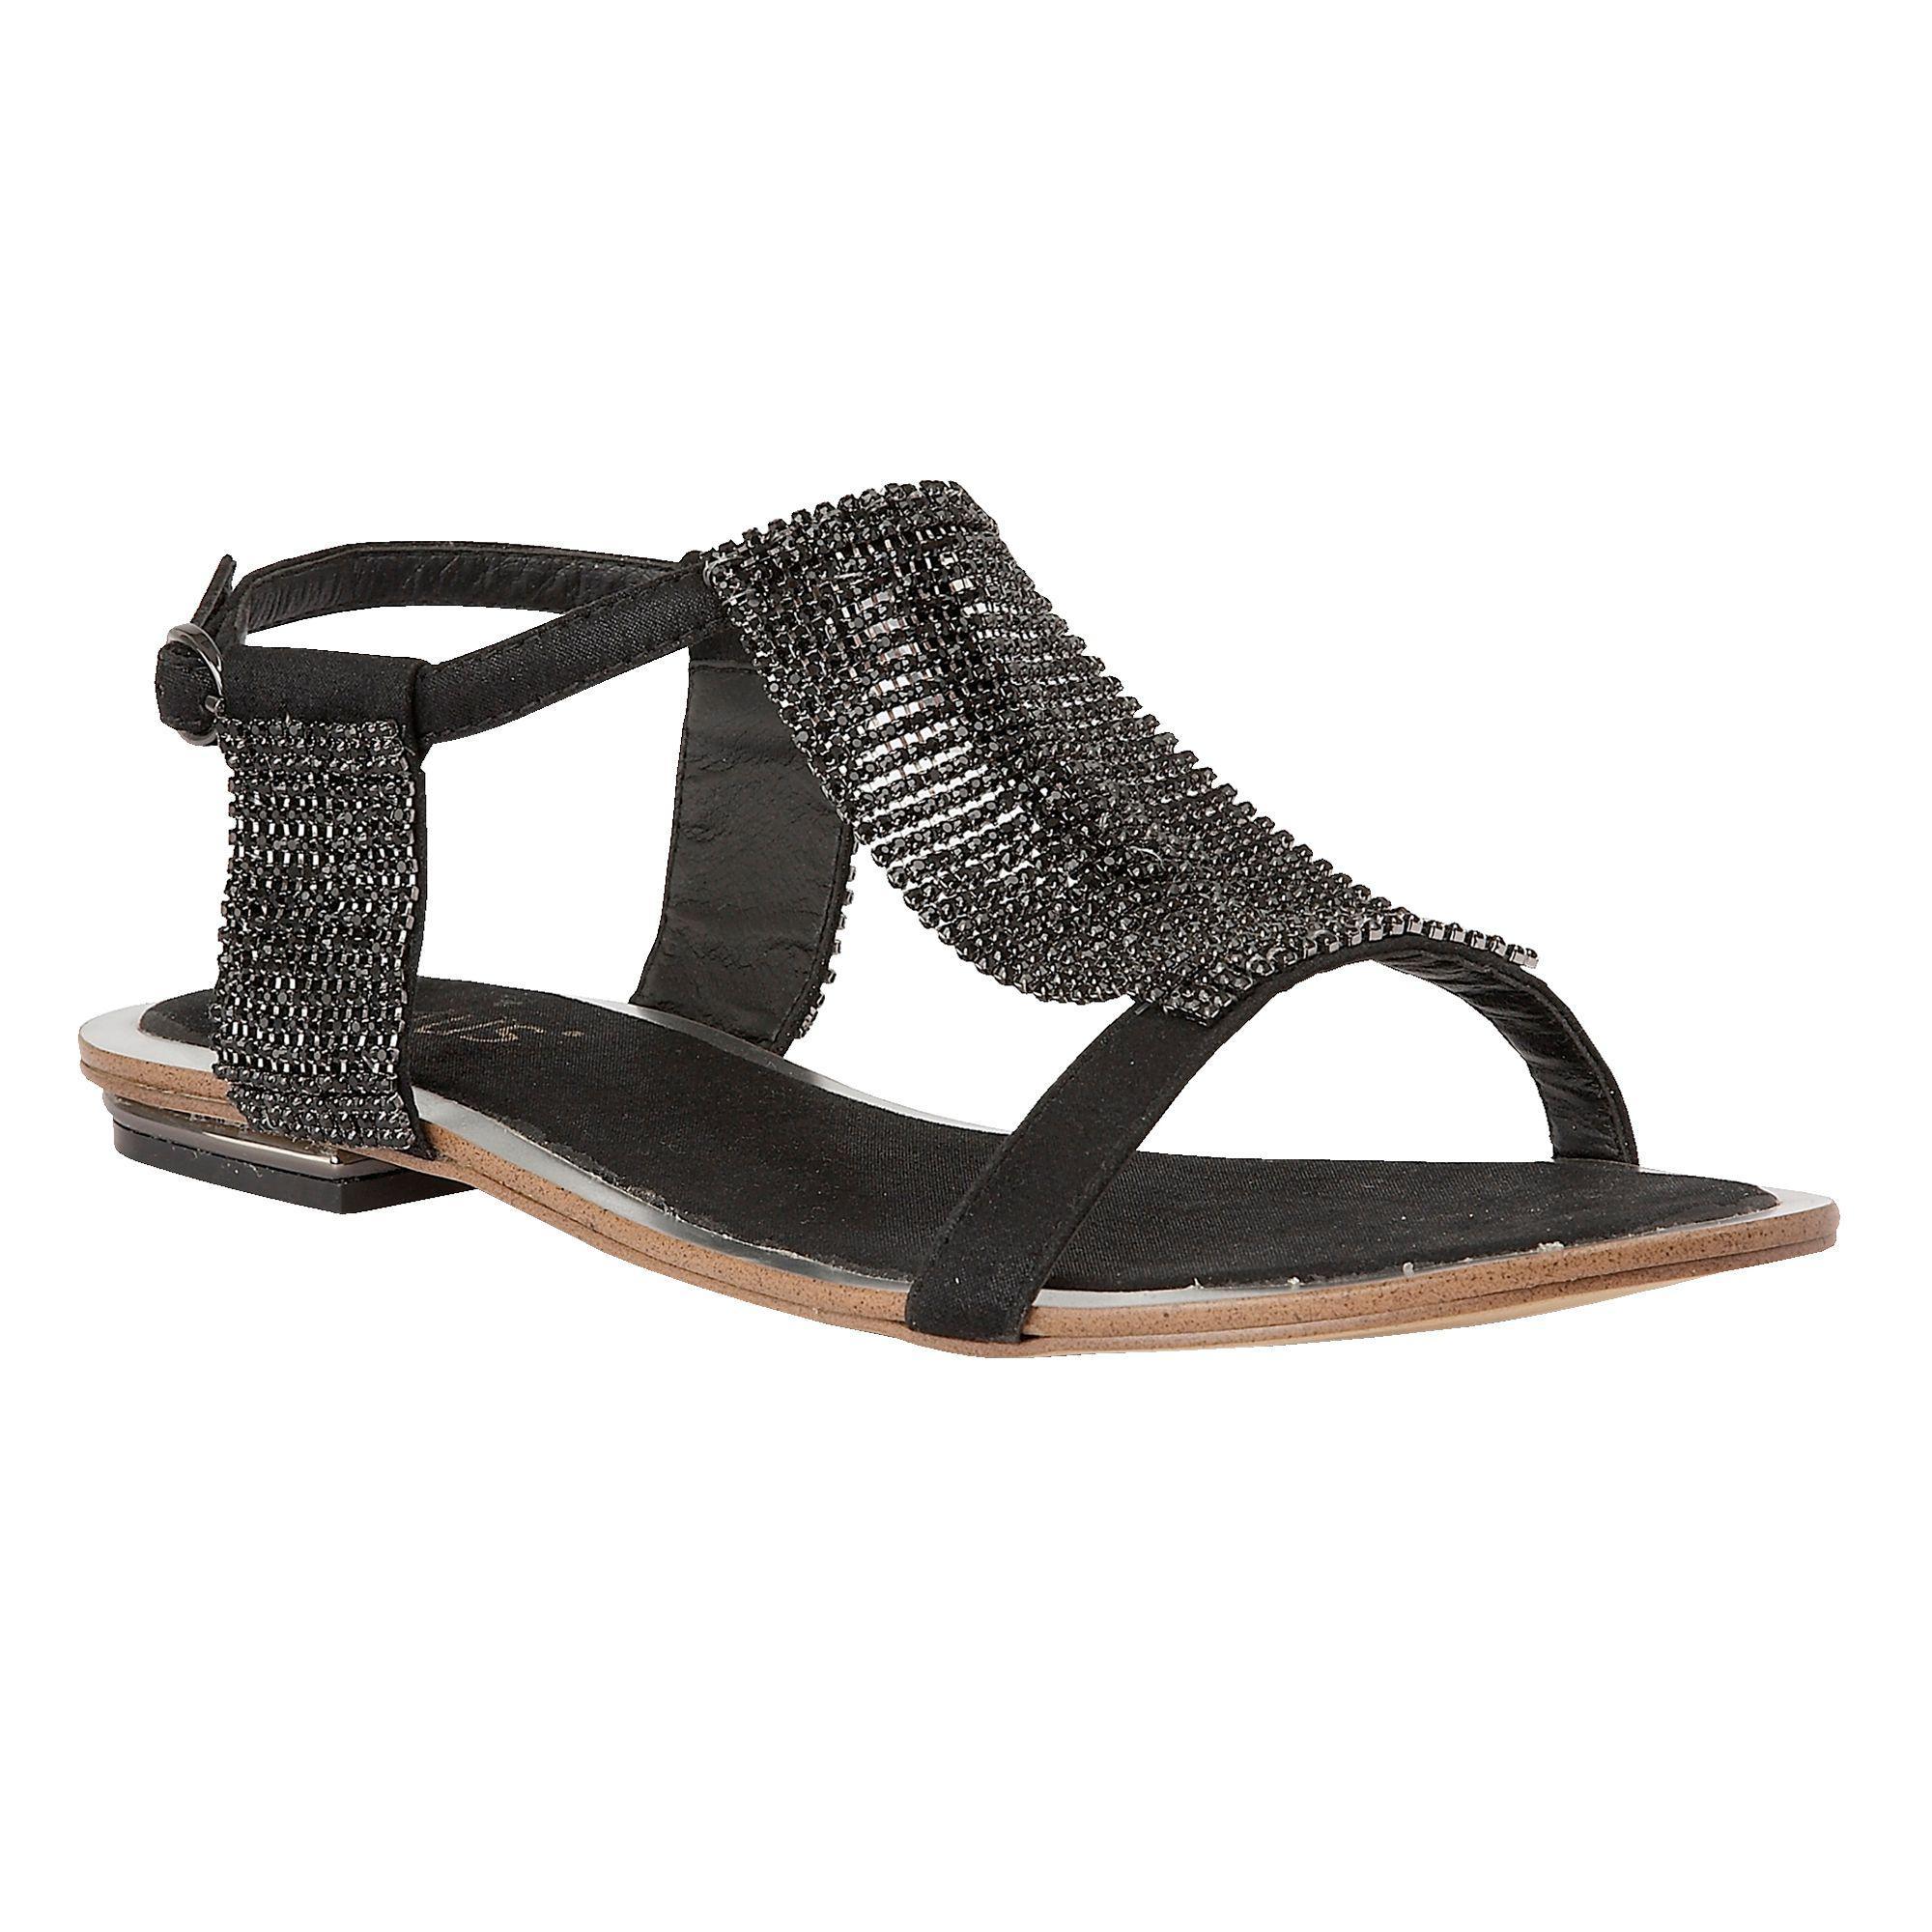 4eae9cda3087 Lotus Black Diamante 'agnetha' T-bar Sandals in Black - Lyst